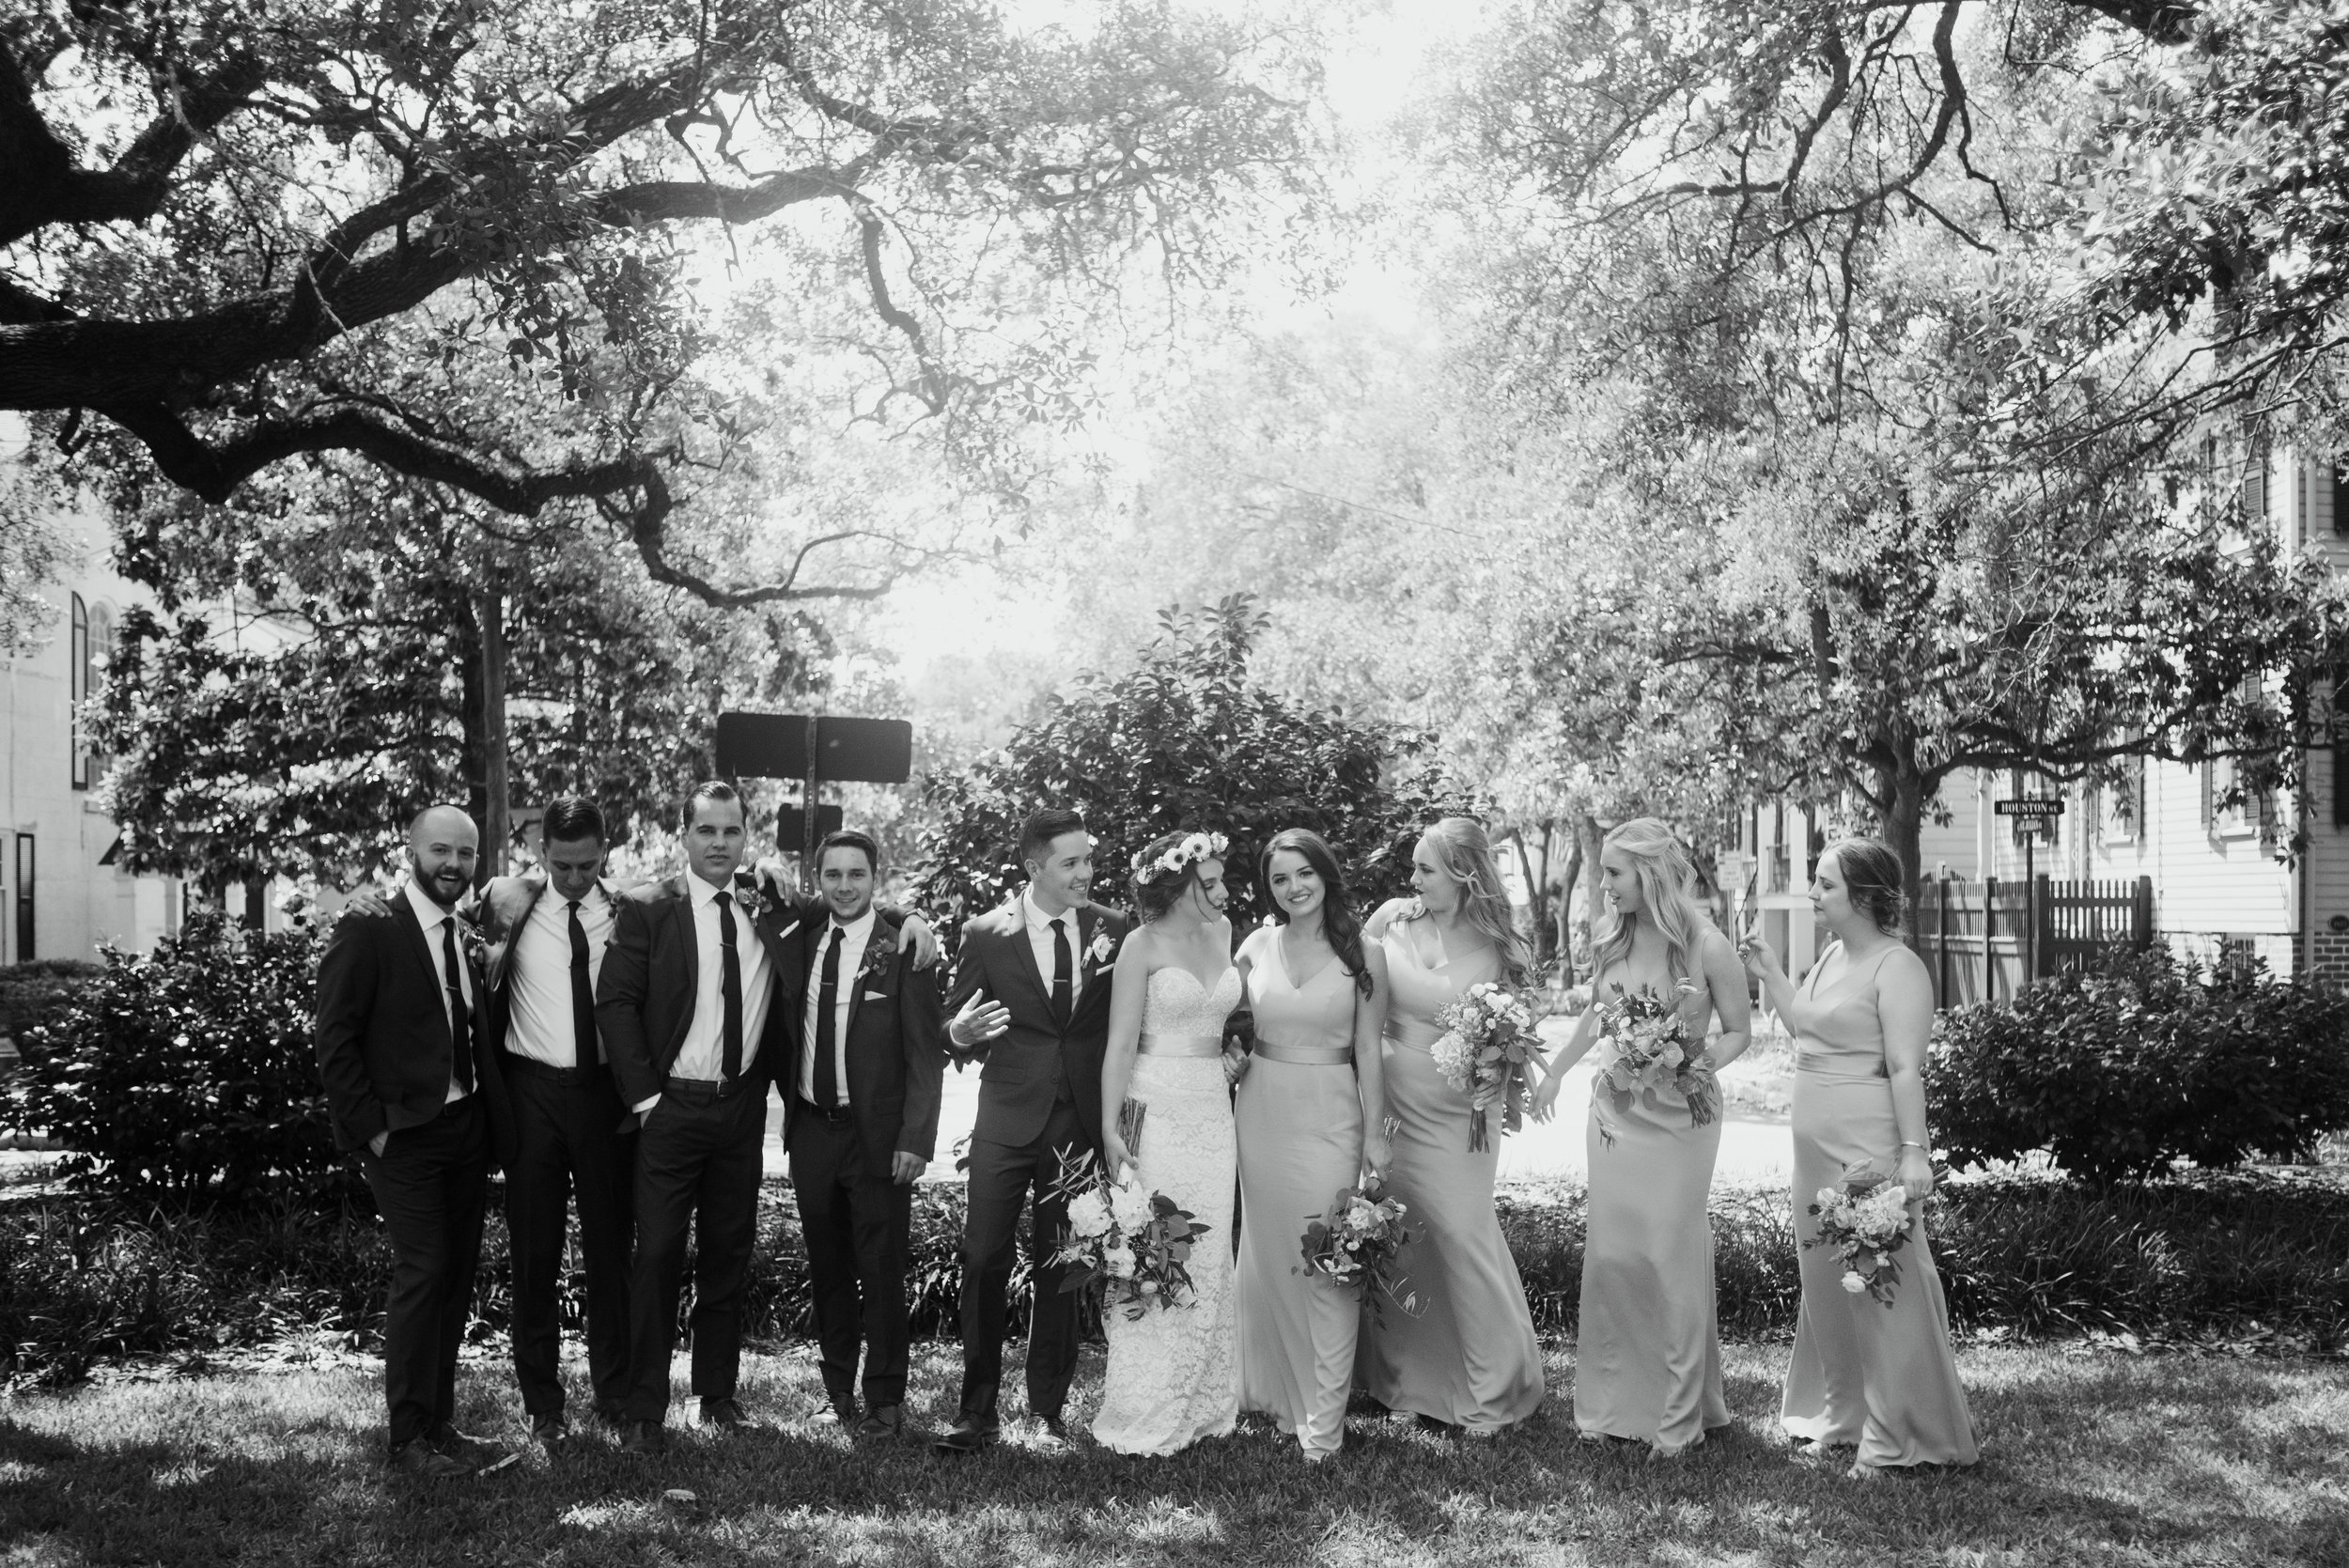 savannah-station-elopement-photographer-savannah-elopement-photography-savannah-georgia-elopement-photographer-savannah-wedding-photographer-meg-hill-photo-jade-hill- (35 of 93).jpg